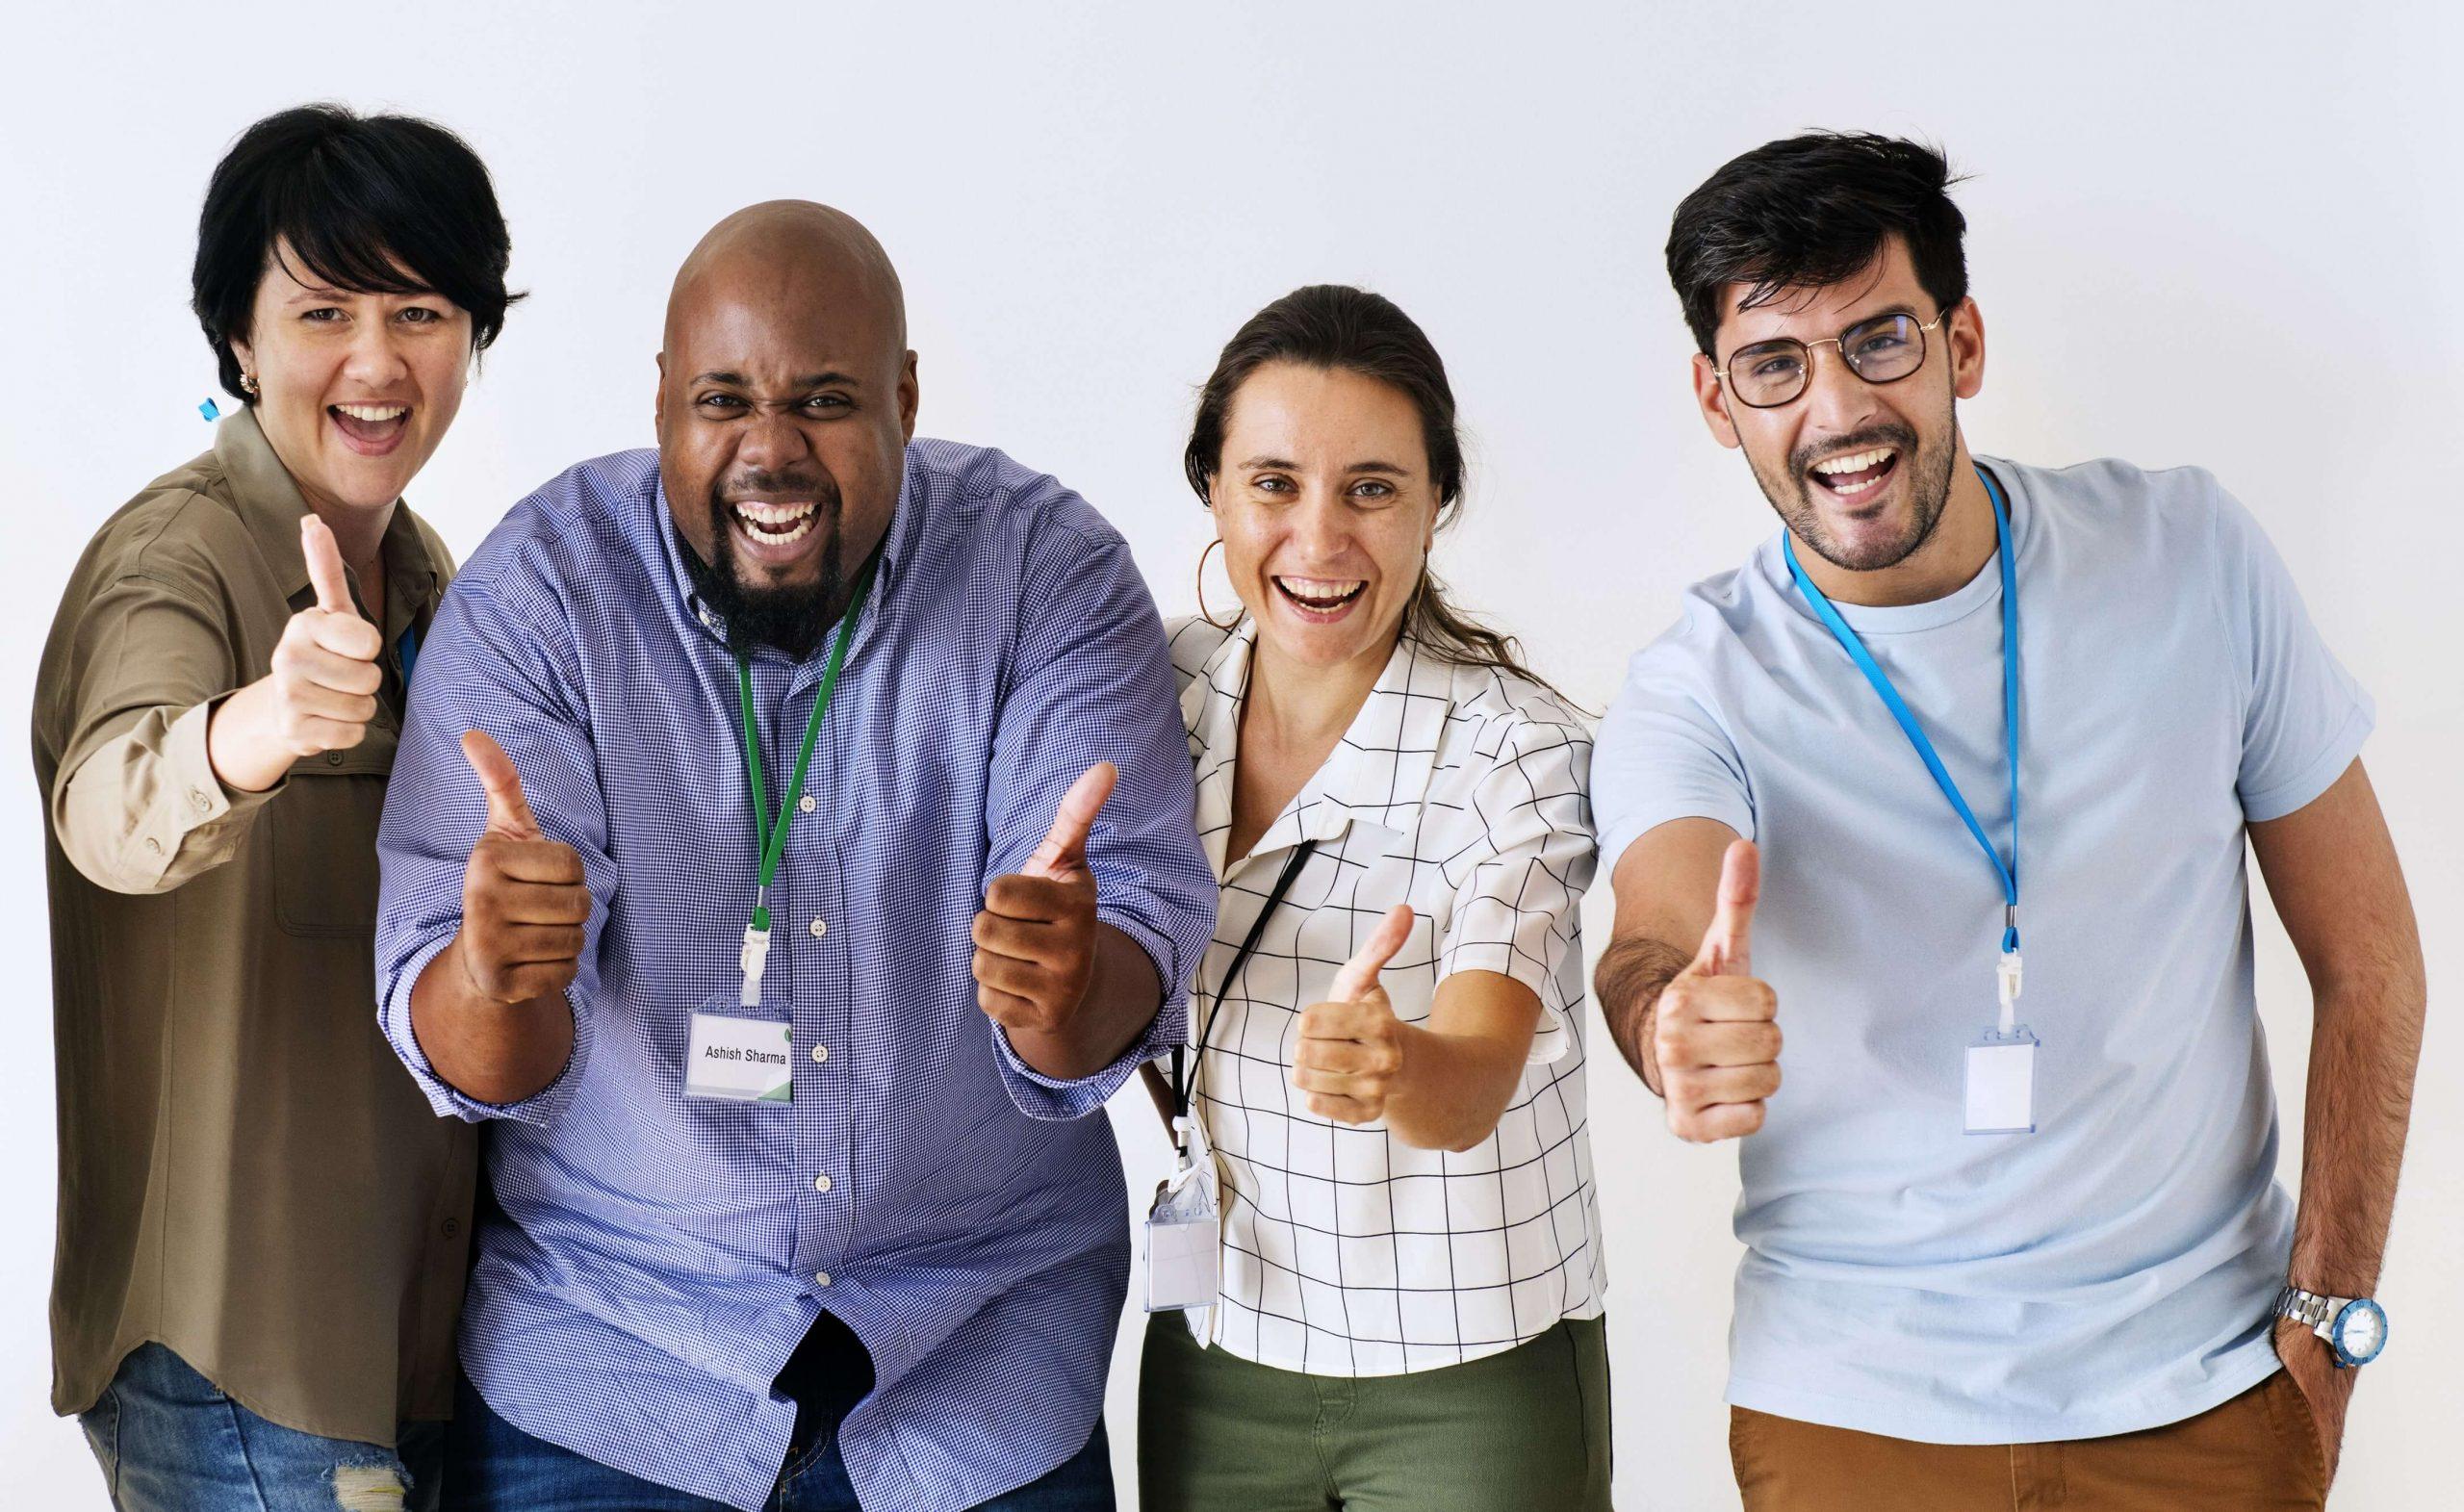 Employee Engagement Platform to boost productivity